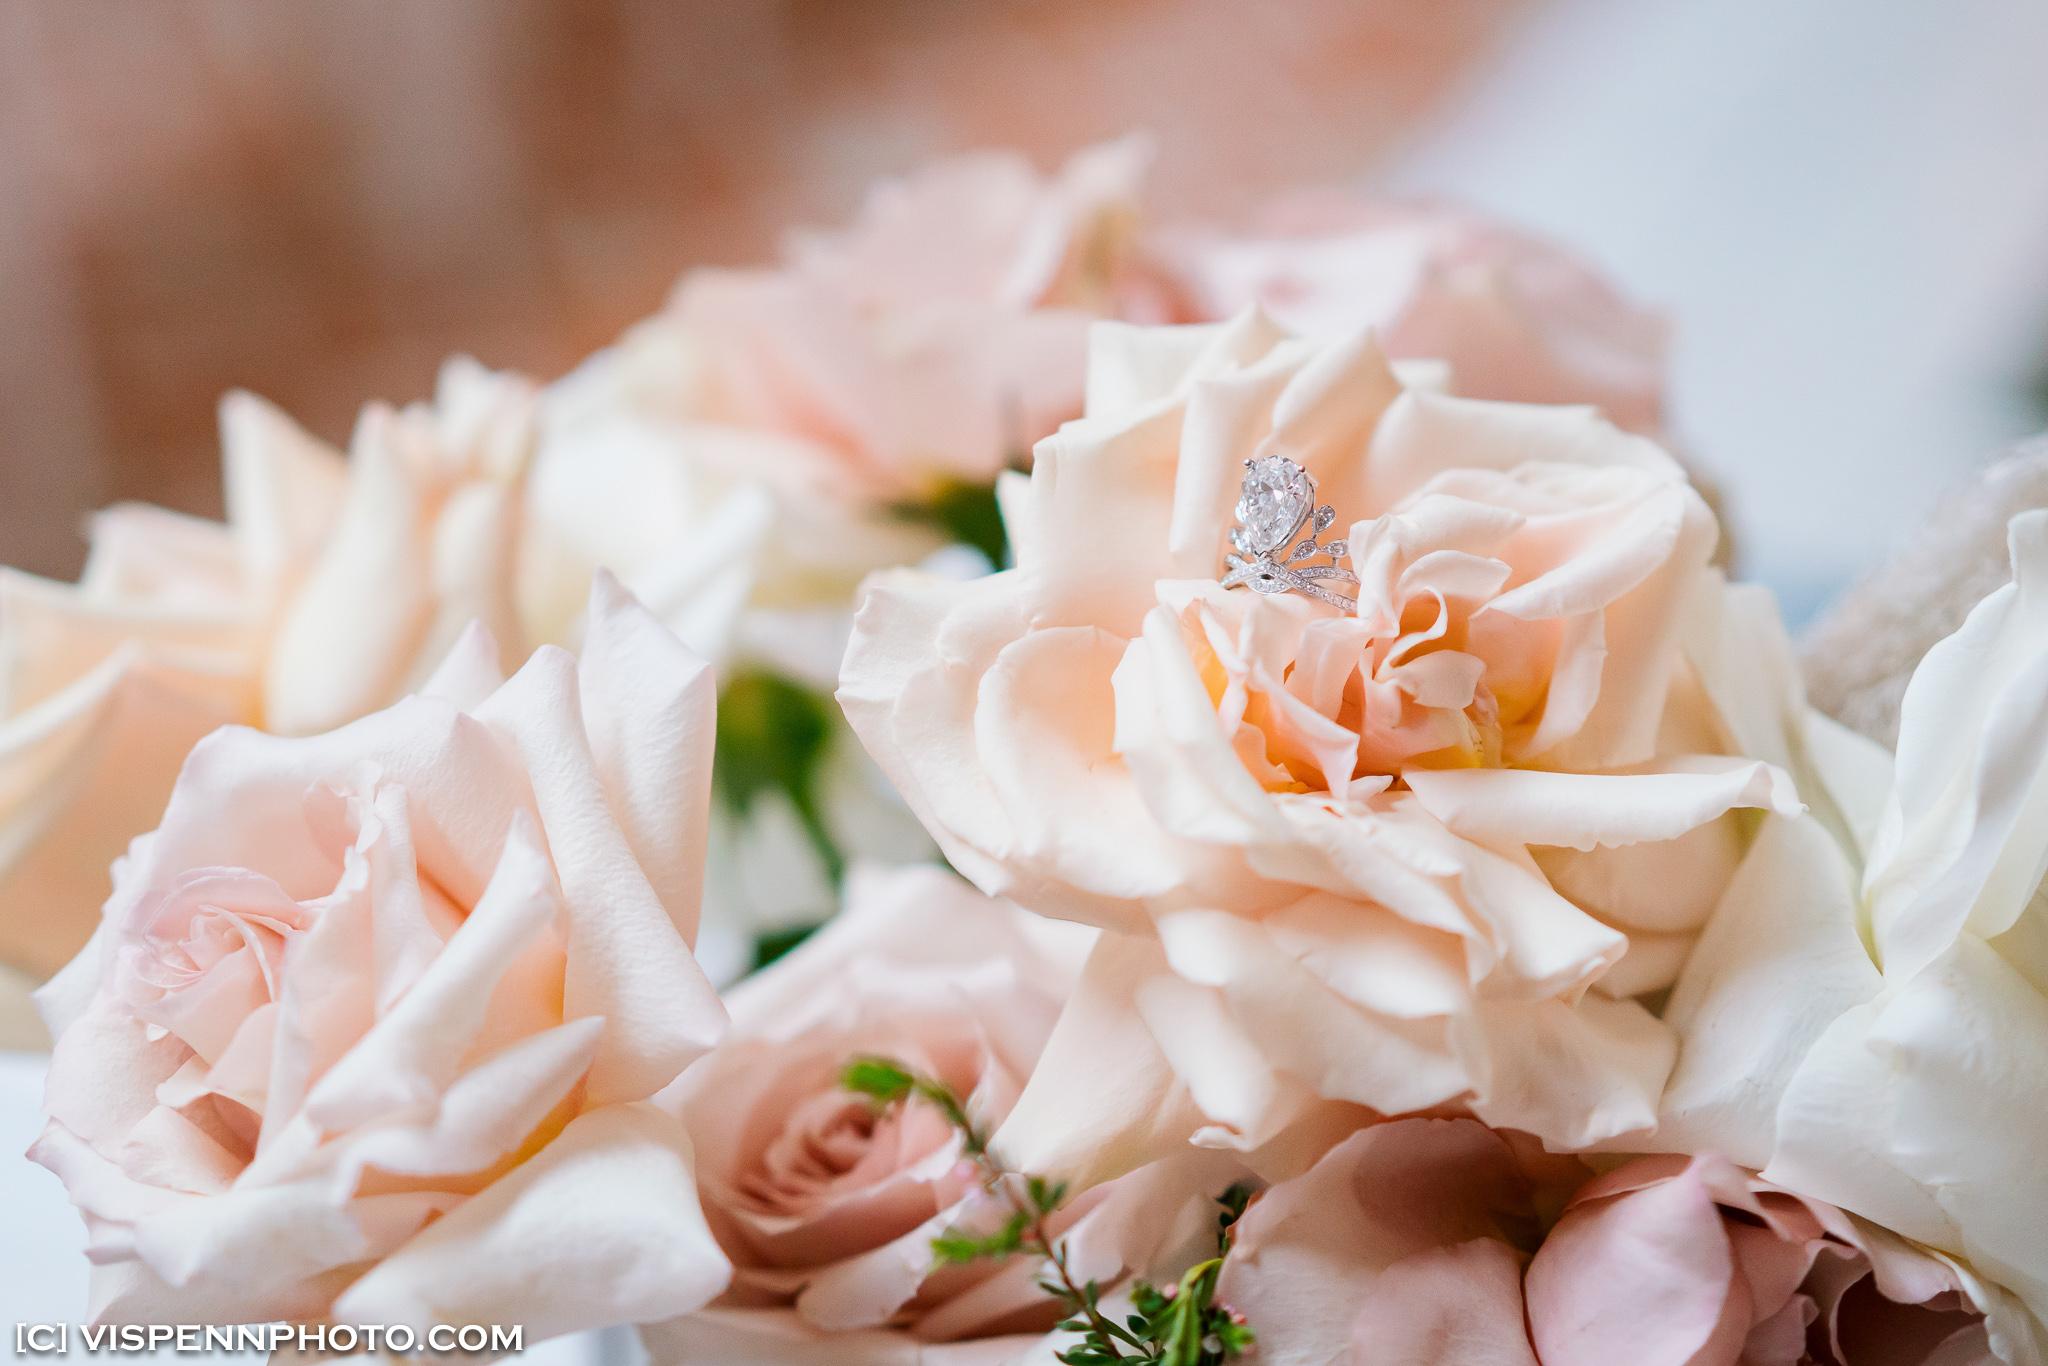 WEDDING DAY Photography Melbourne VISPENN 墨尔本 婚礼跟拍 婚礼摄像 婚礼摄影 结婚照 登记照 VISPENN 0107